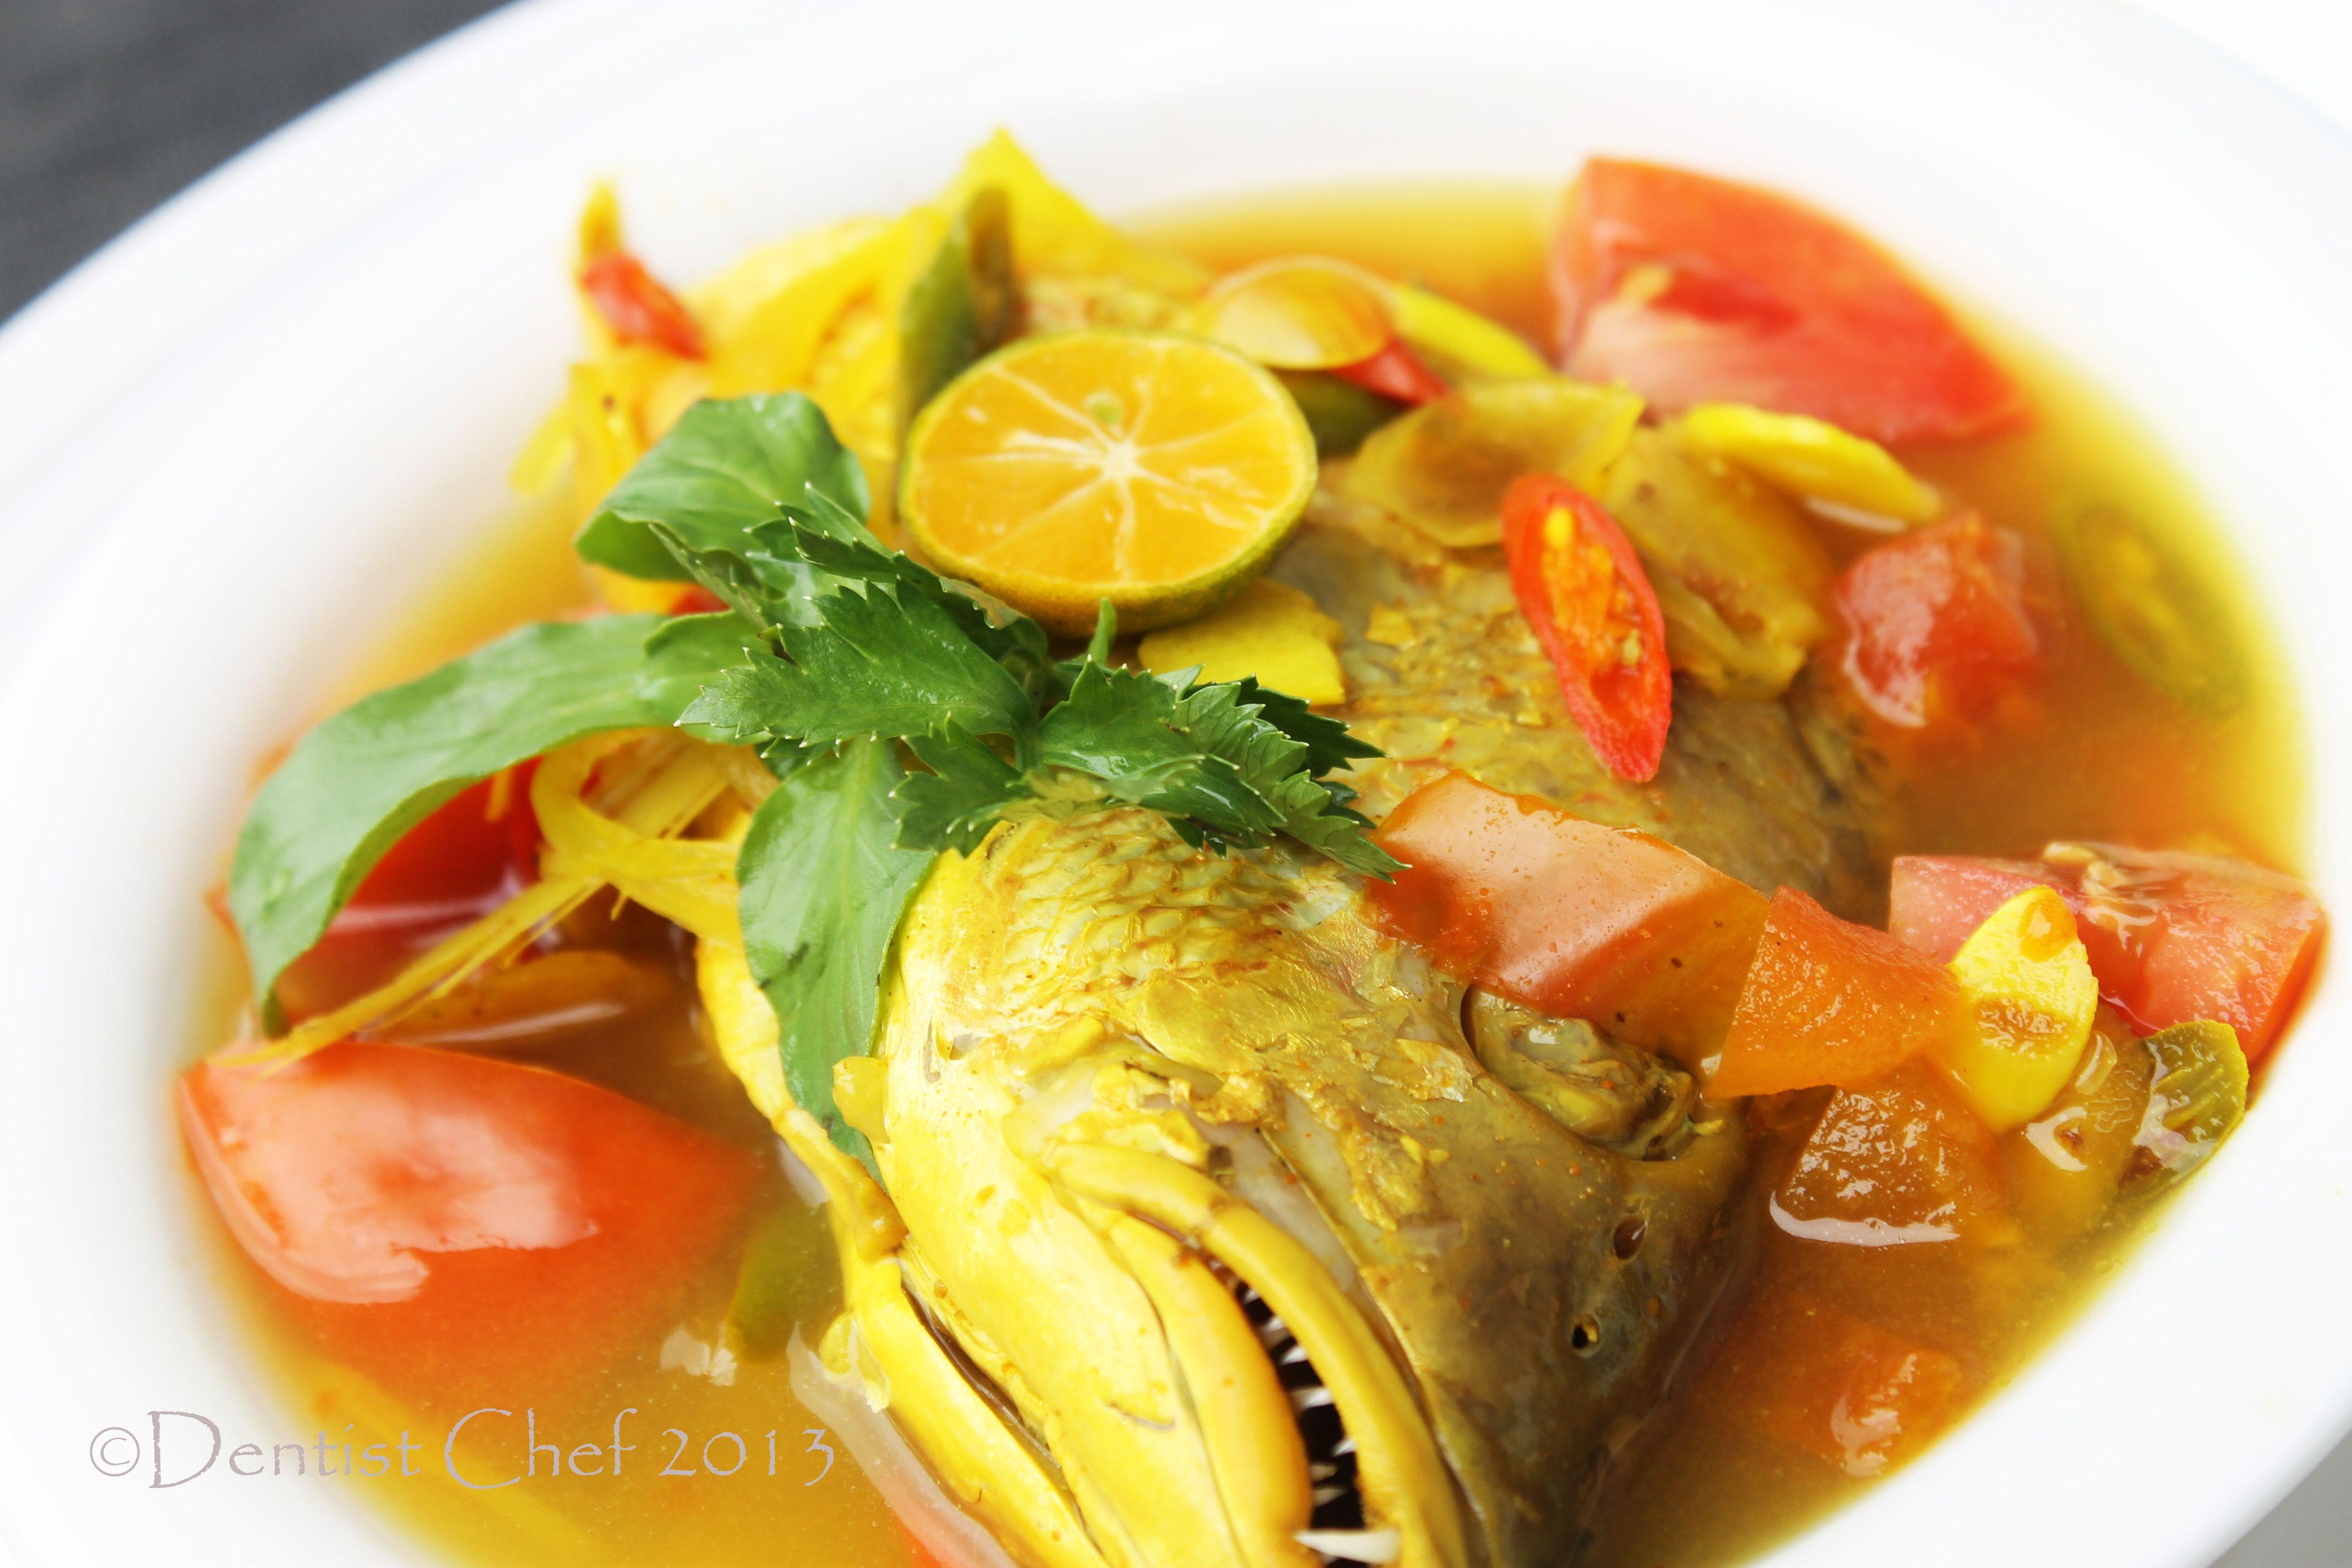 Resep Palumara Ulu Juku Spicy Red Snapper Fish Soup Recipe With Tomato Chilli Tamarind Lemongrass And Turmeric Fish Soup Tomato Recipes Asian Fish Recipes